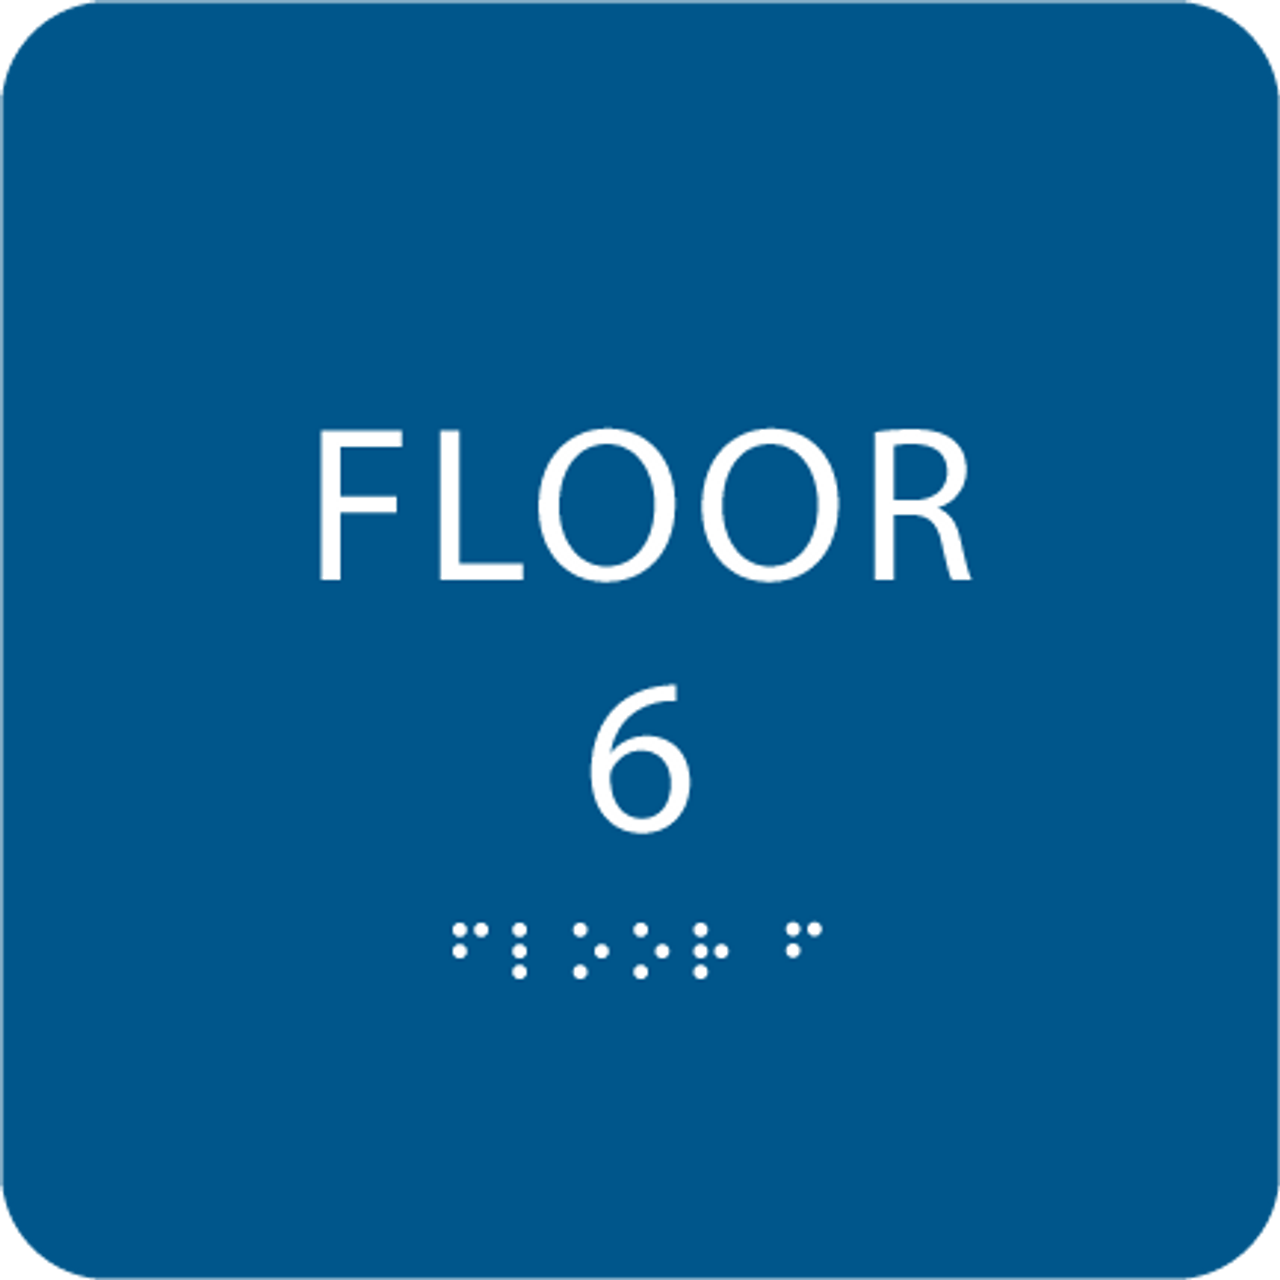 Blue Floor 6 Level Identification ADA Sign